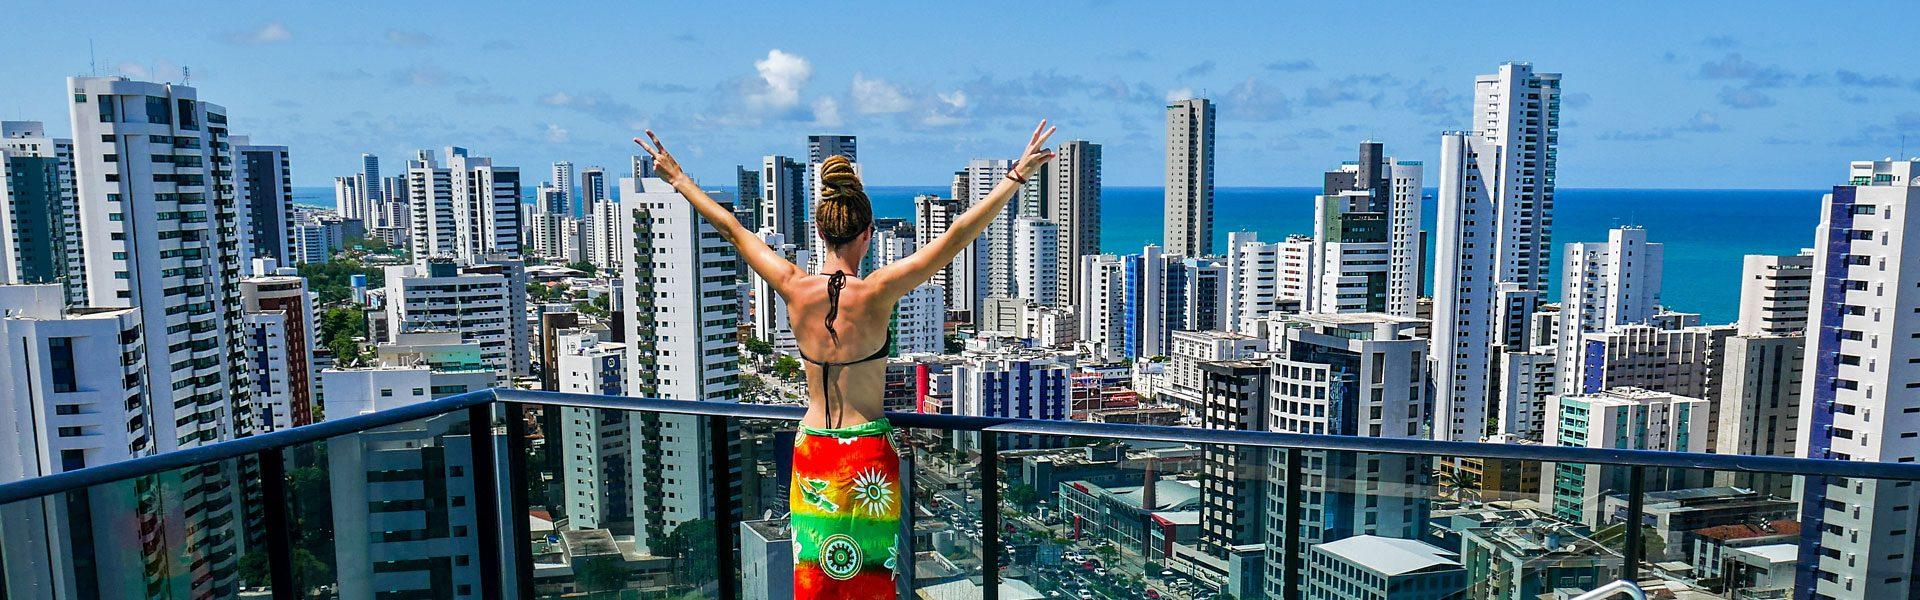 Rasta girl overlooking Boa Viagem and ocean in Recife, Brazil